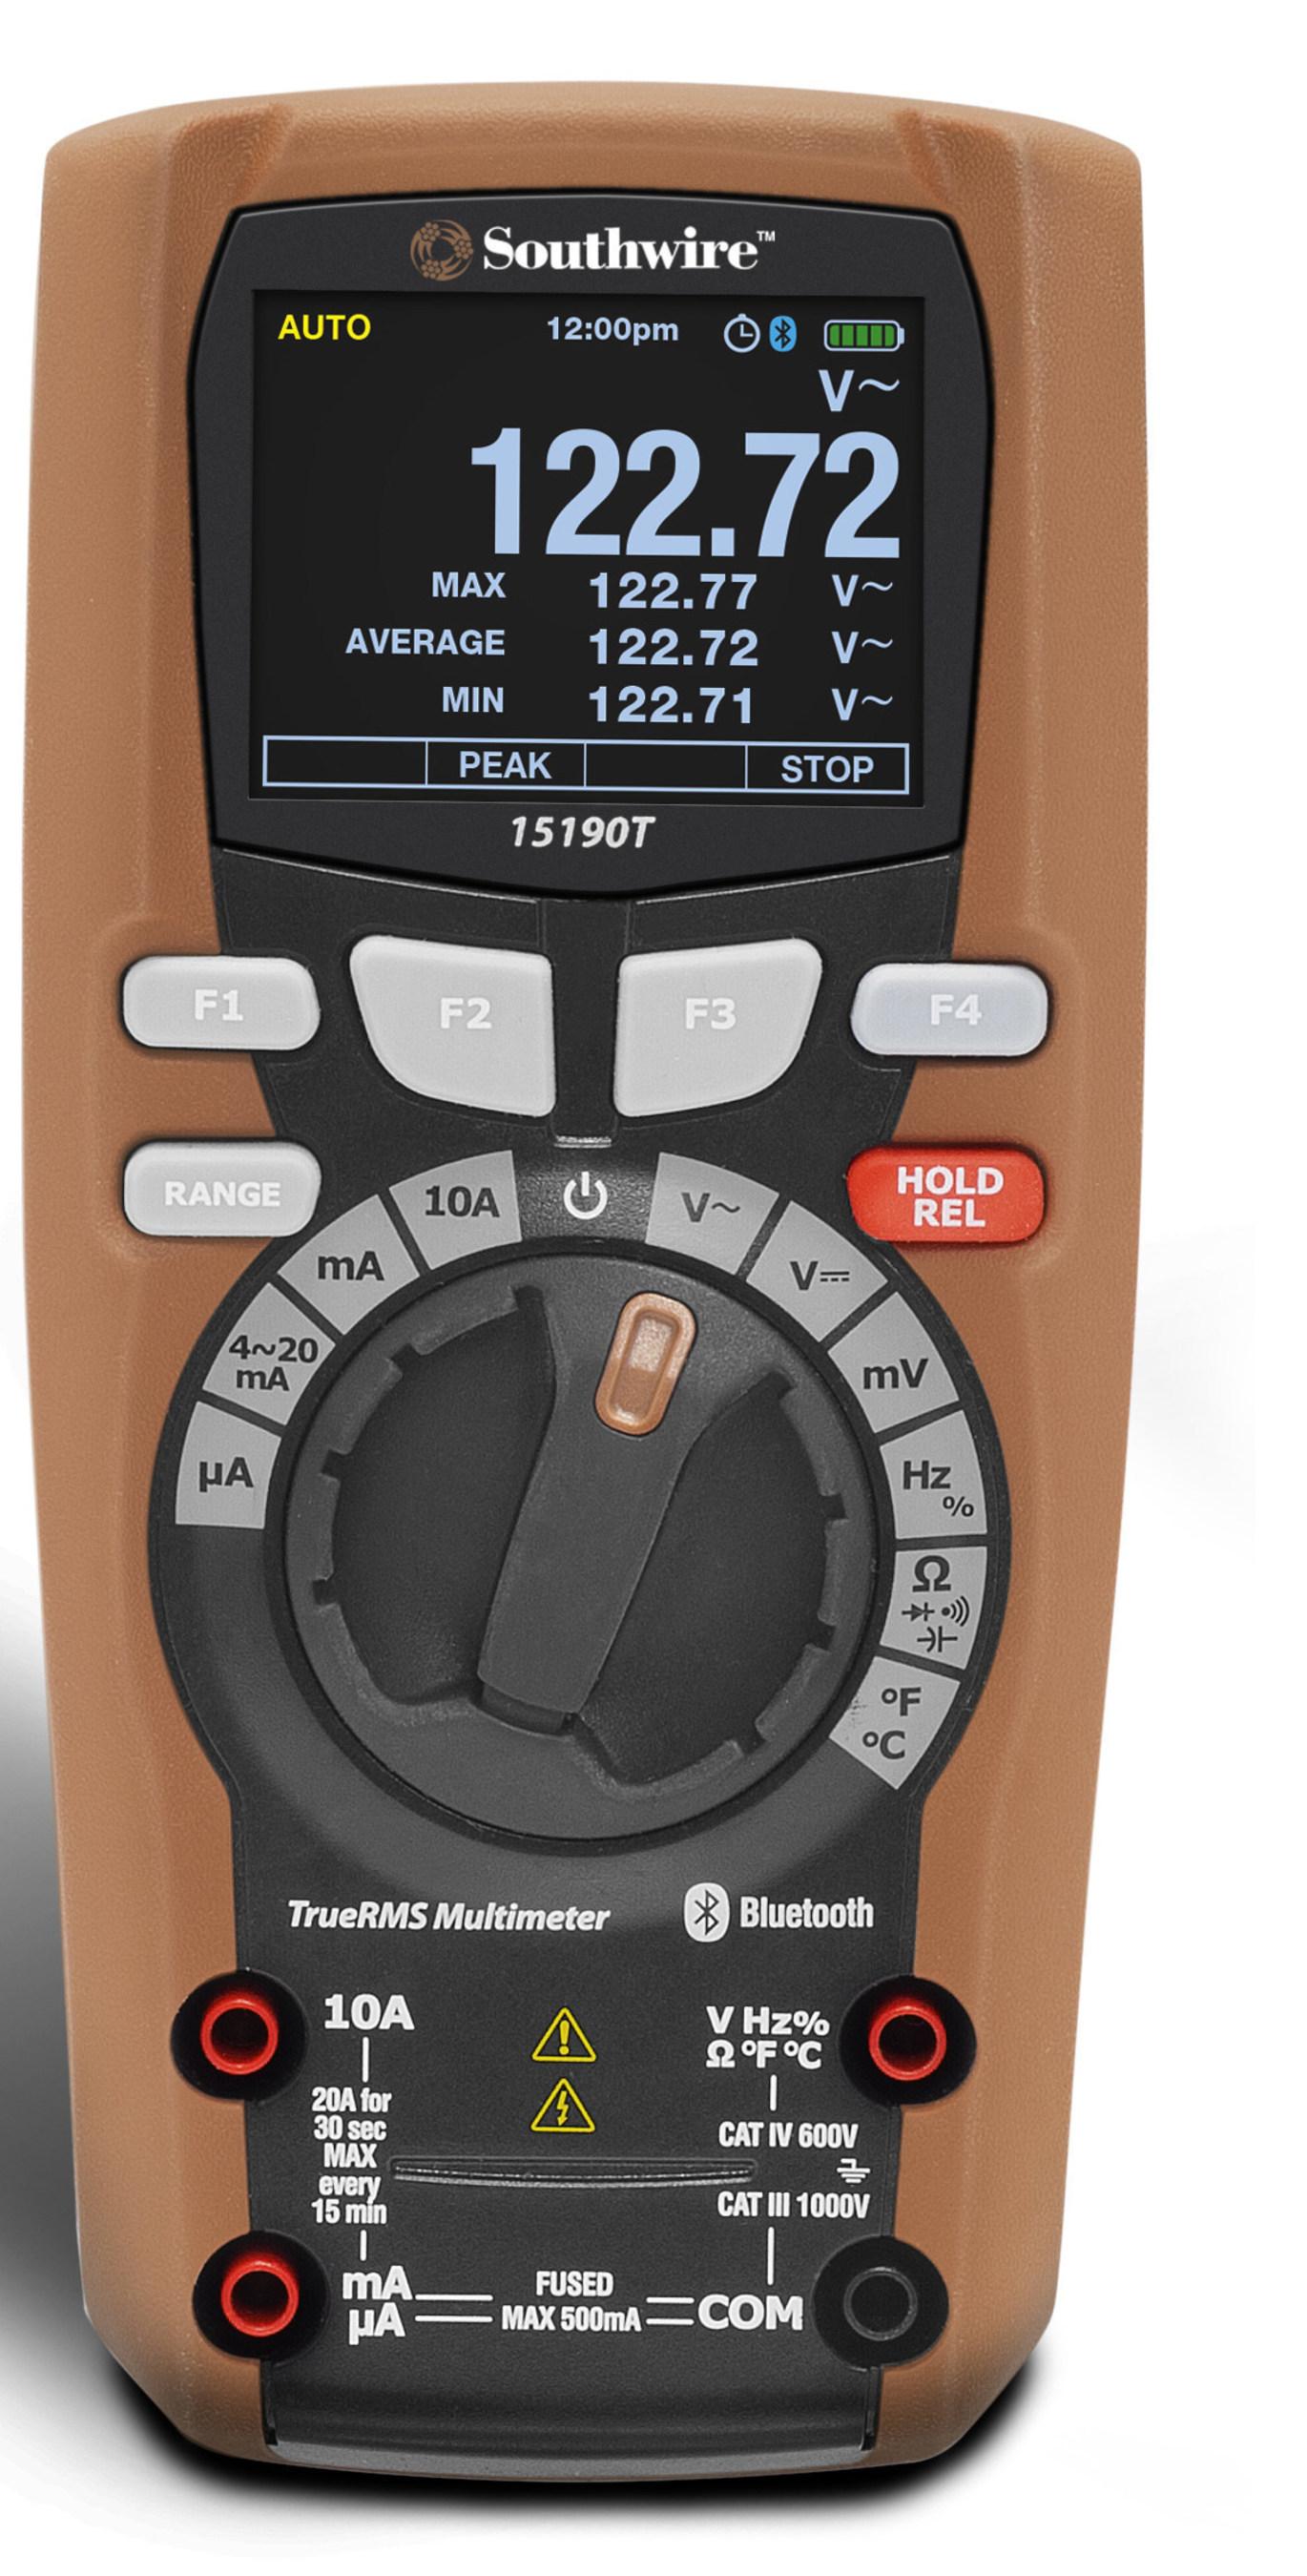 Southwire S New Maintenancepro Smart Multimeter Wins Neca